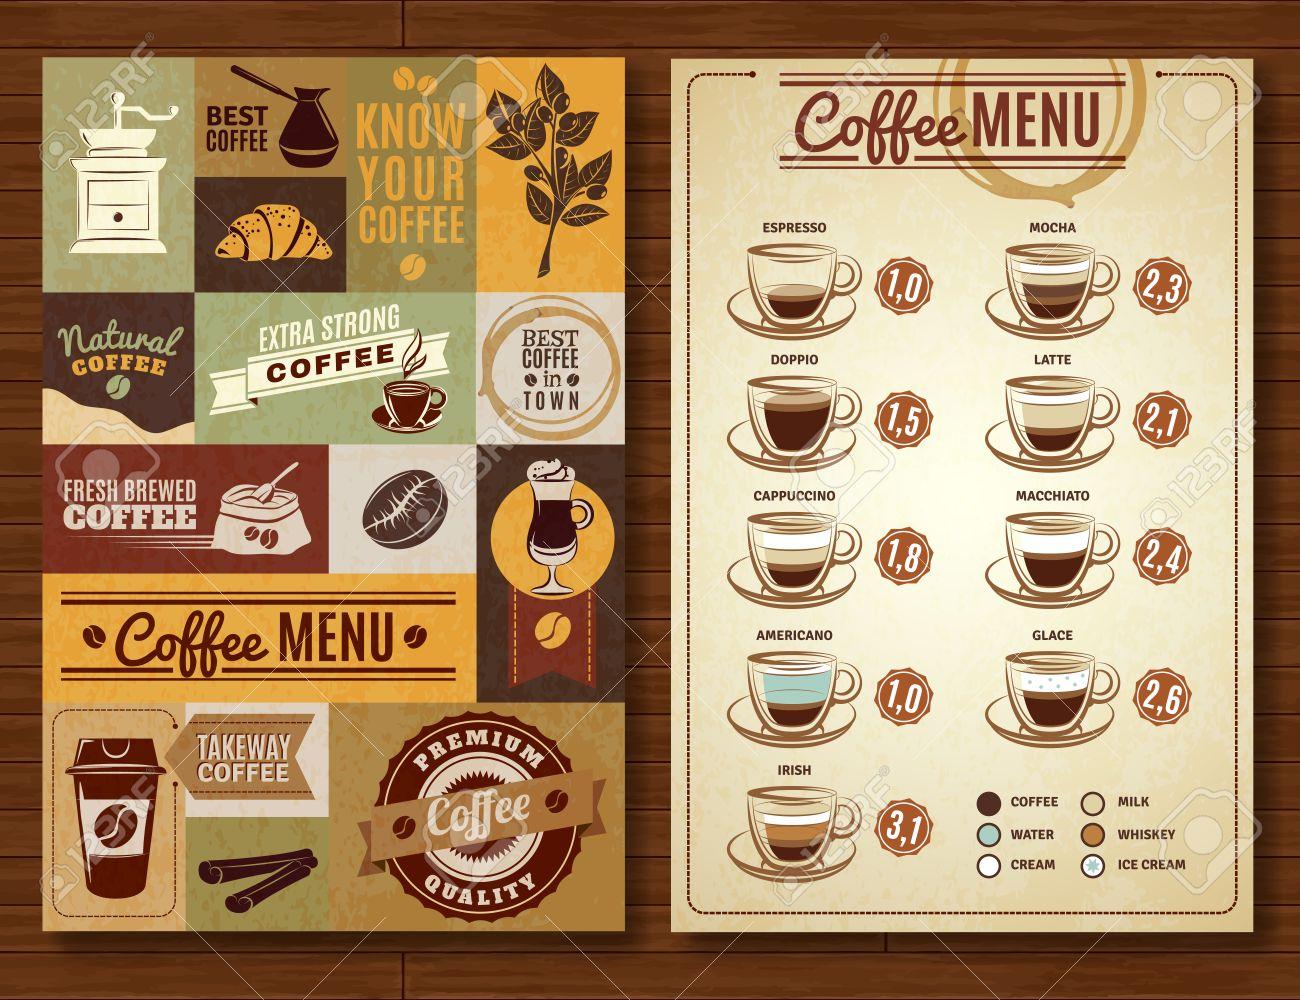 Coffee Menu Board For Bar Cafe Restaurant Vintage Style 2 Vertical ...